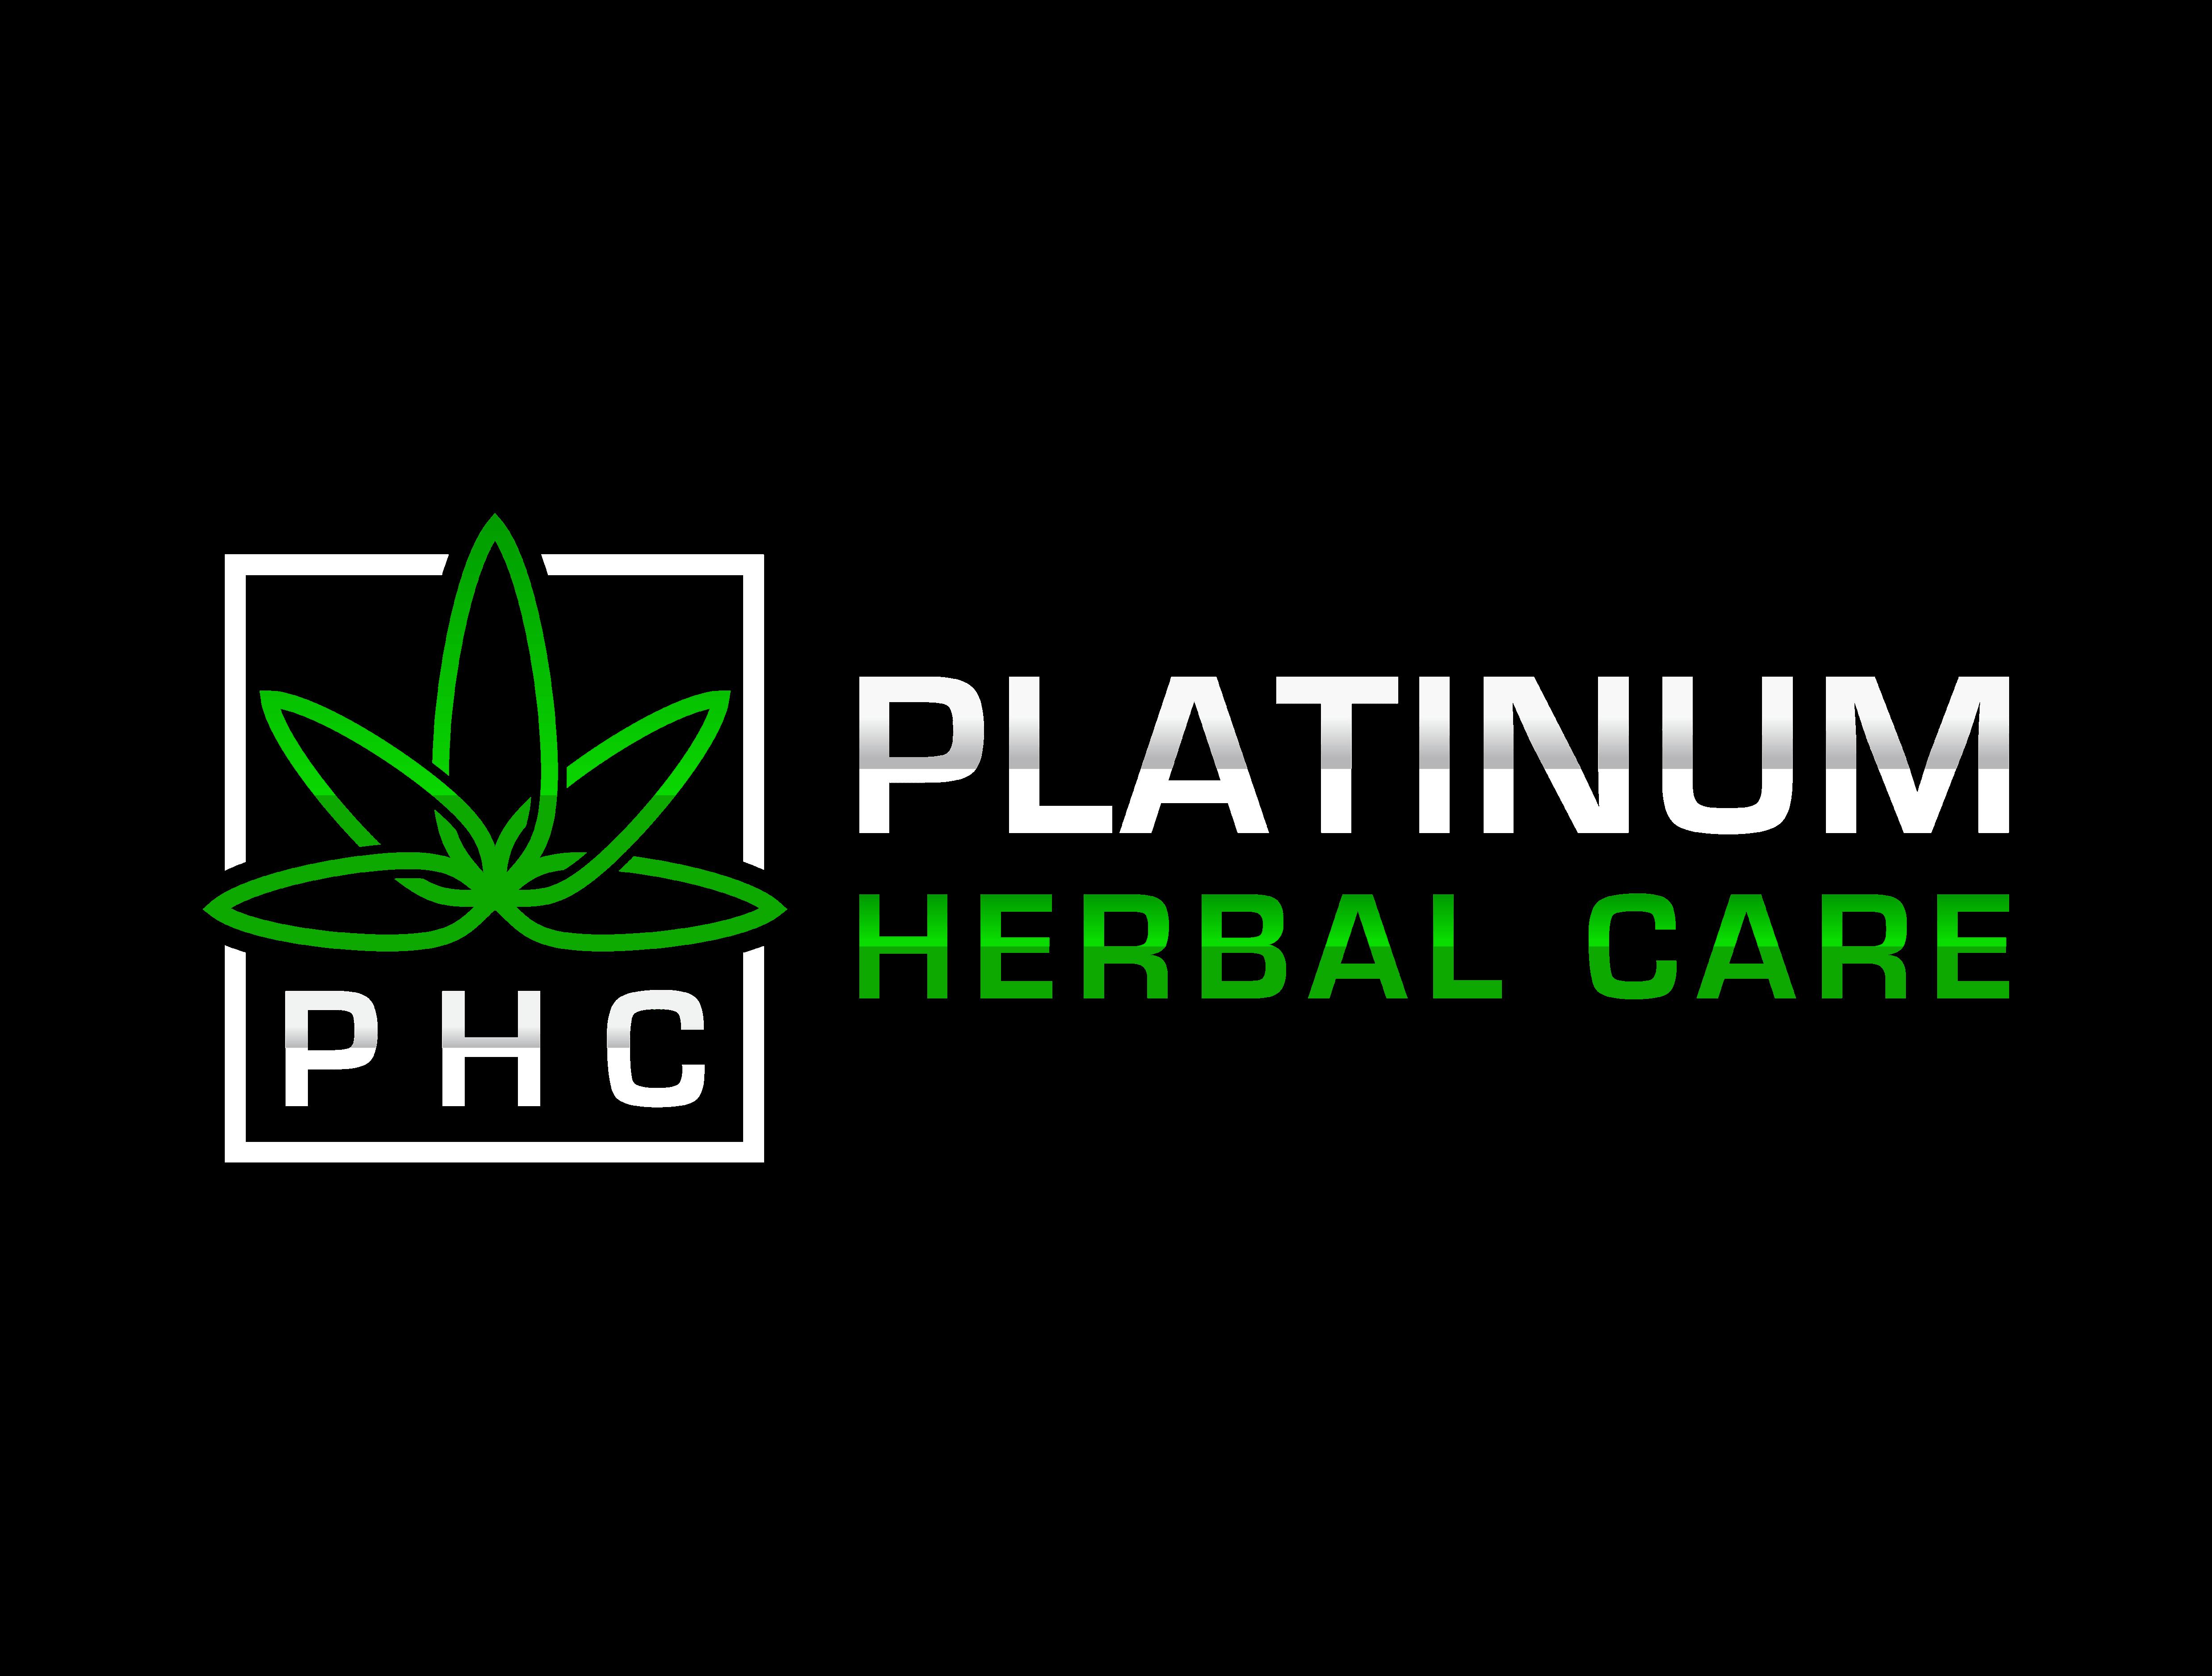 Platinum Herbal Care